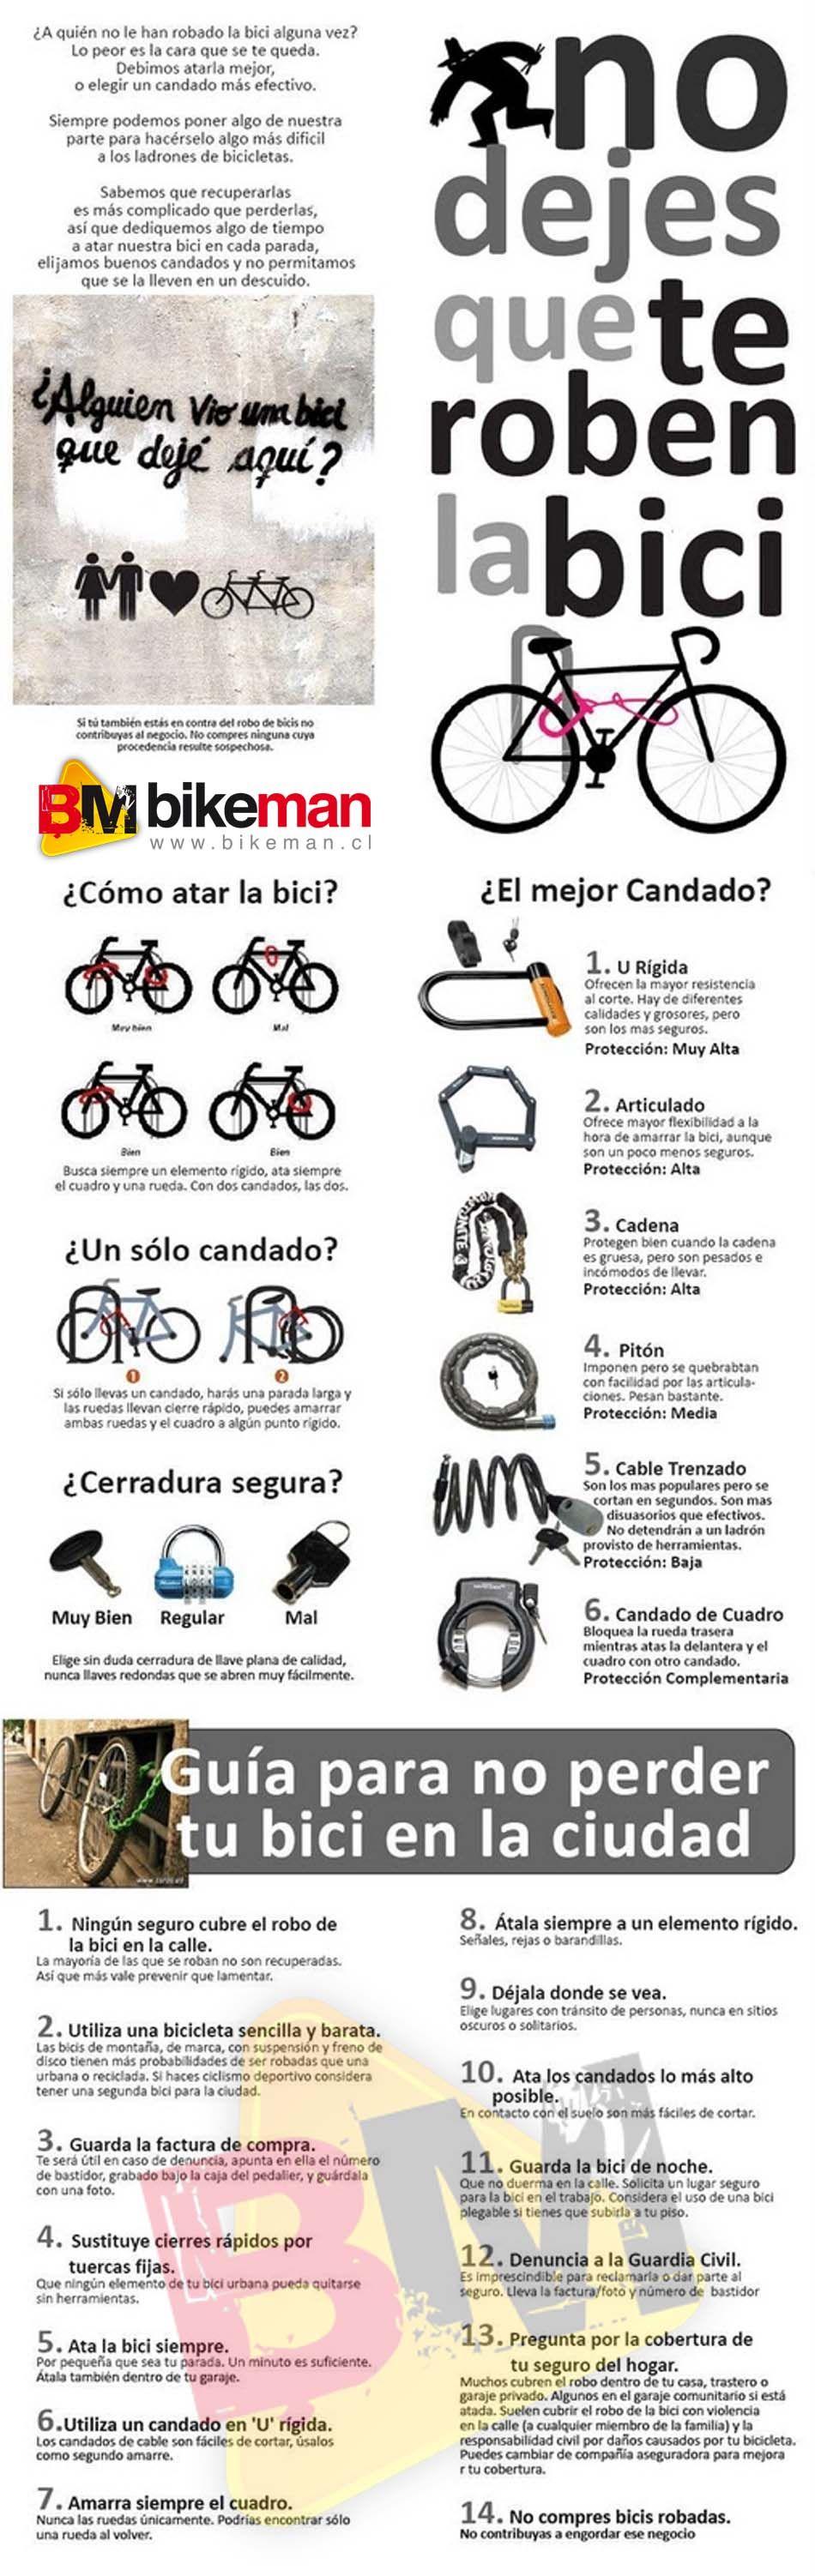 Pin De Orlando Ponce En Fitness Candado Para Bicicleta Consejos De Ciclismo Bicicleteria